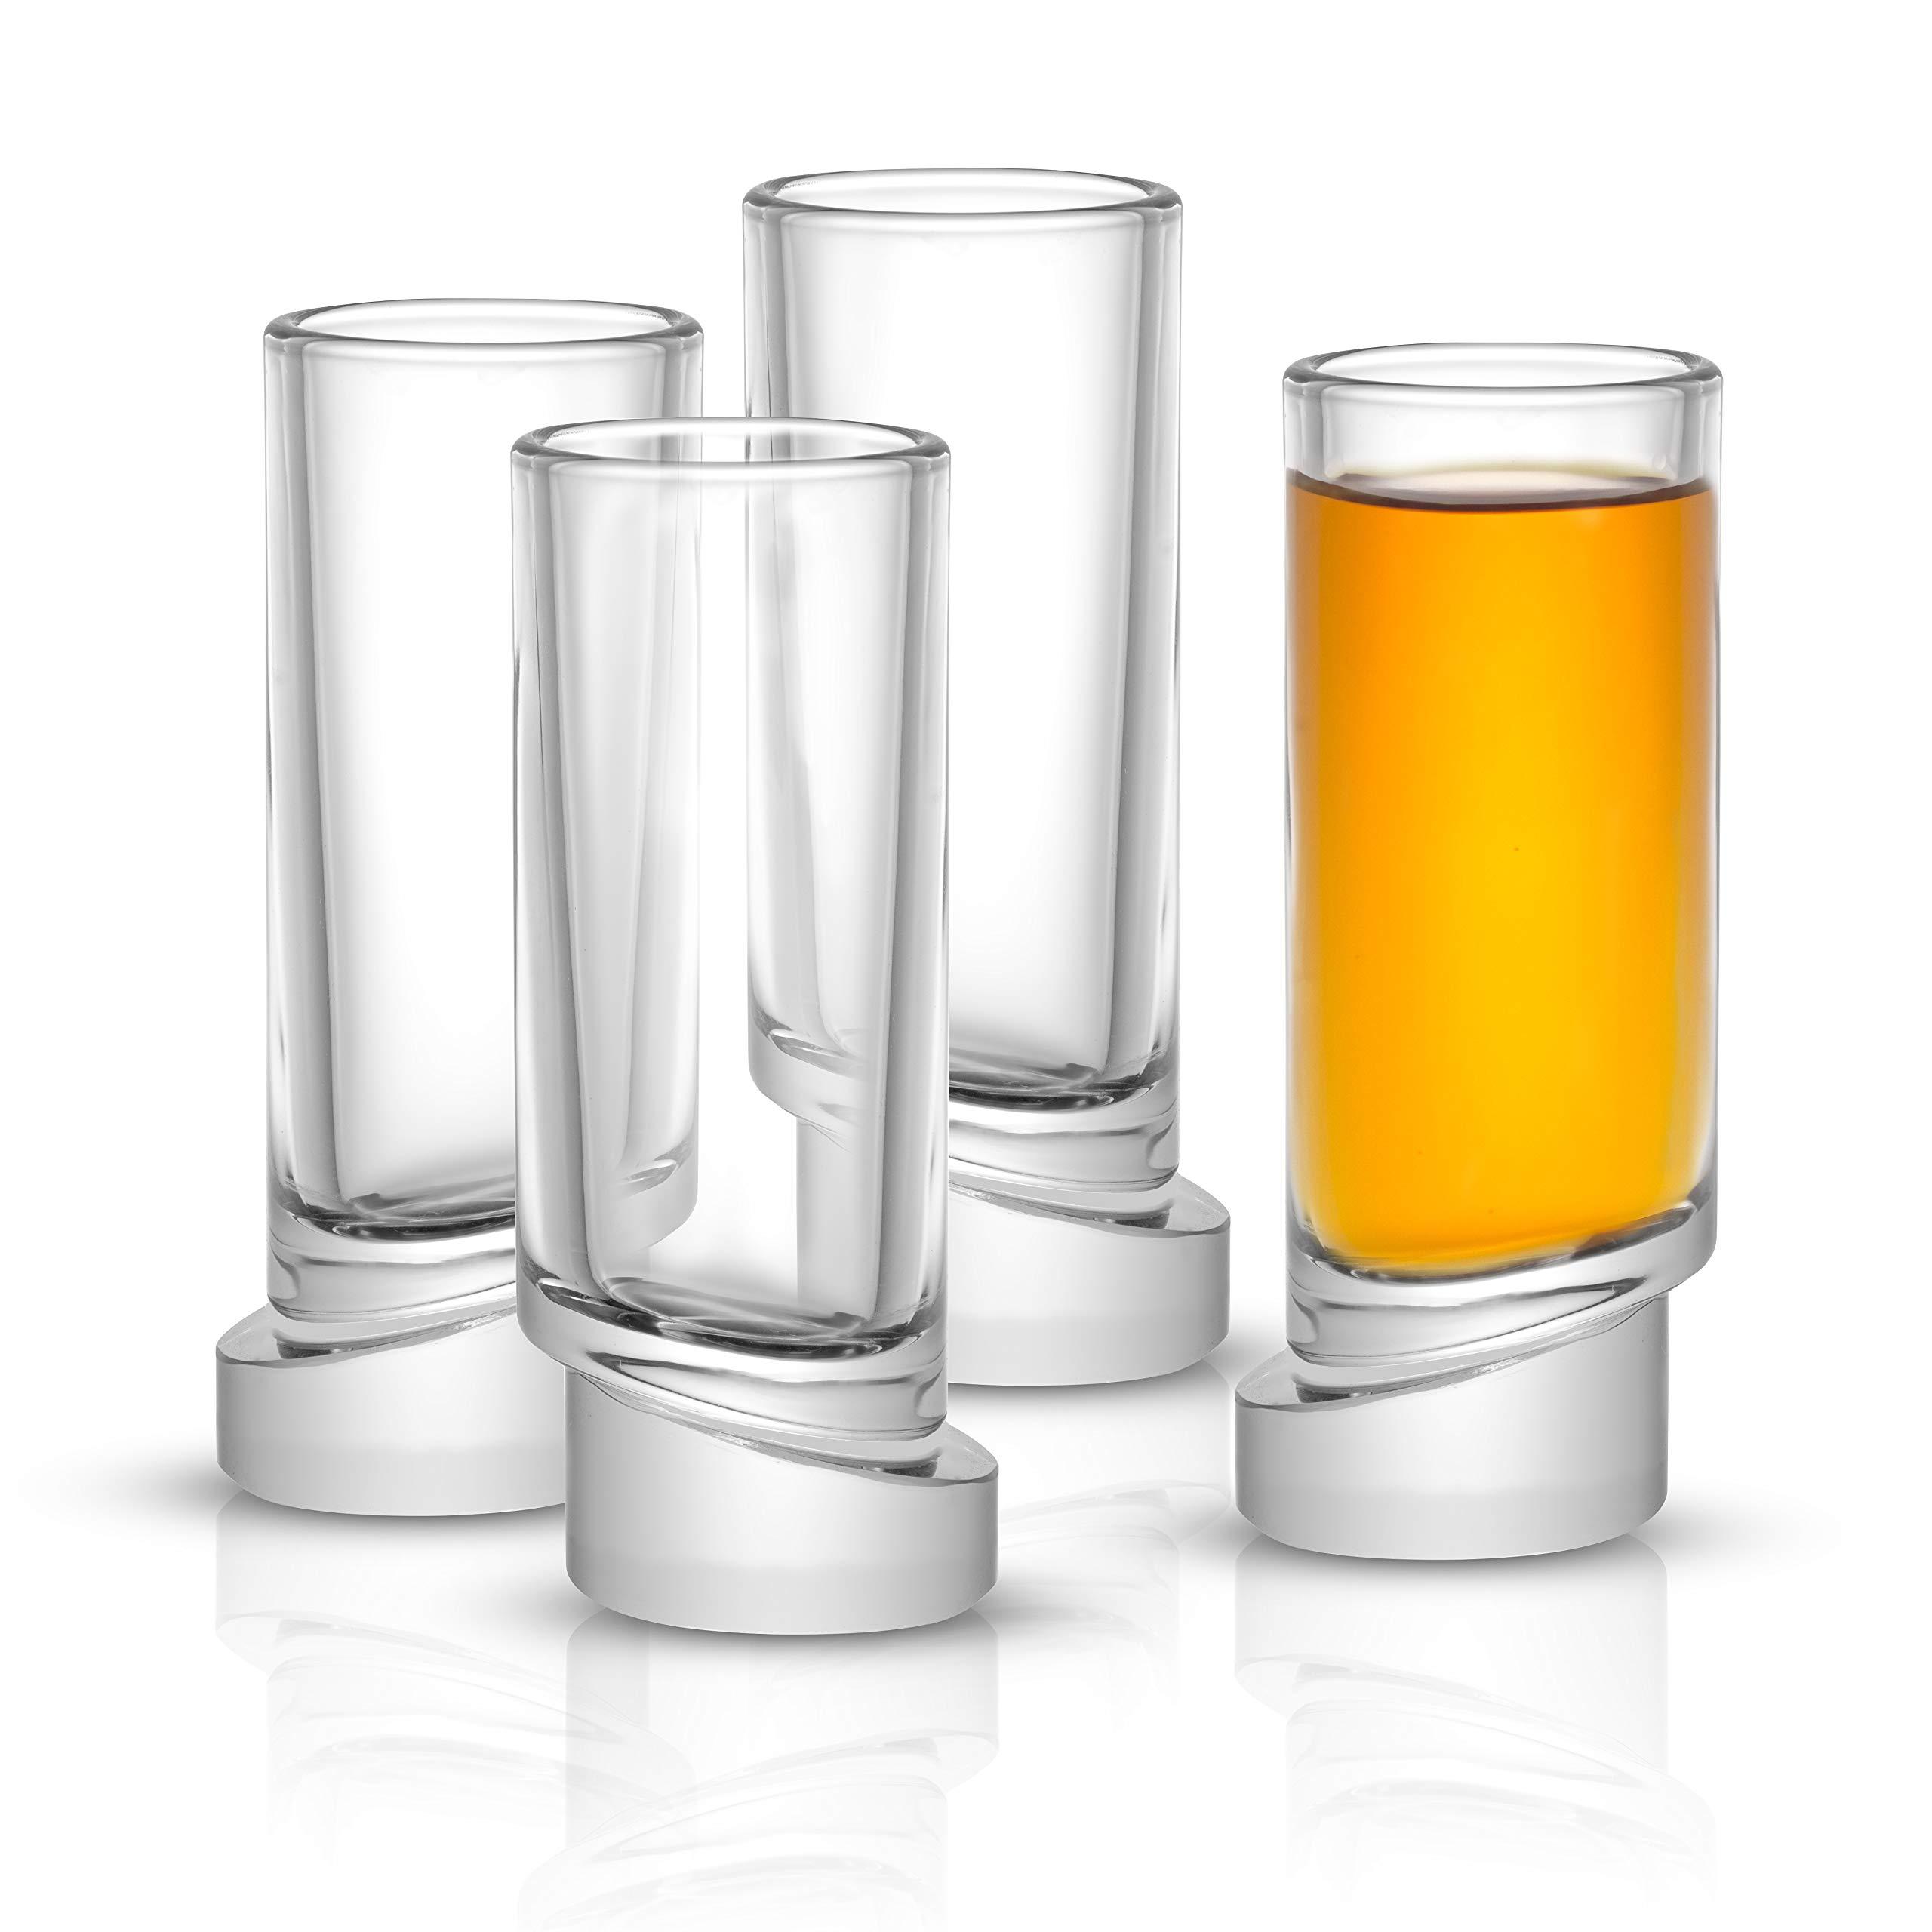 JoyJolt Round Aqua Vitae 1.69 oz Crystal Shot Glasses Set of 4 Off Base Glasses